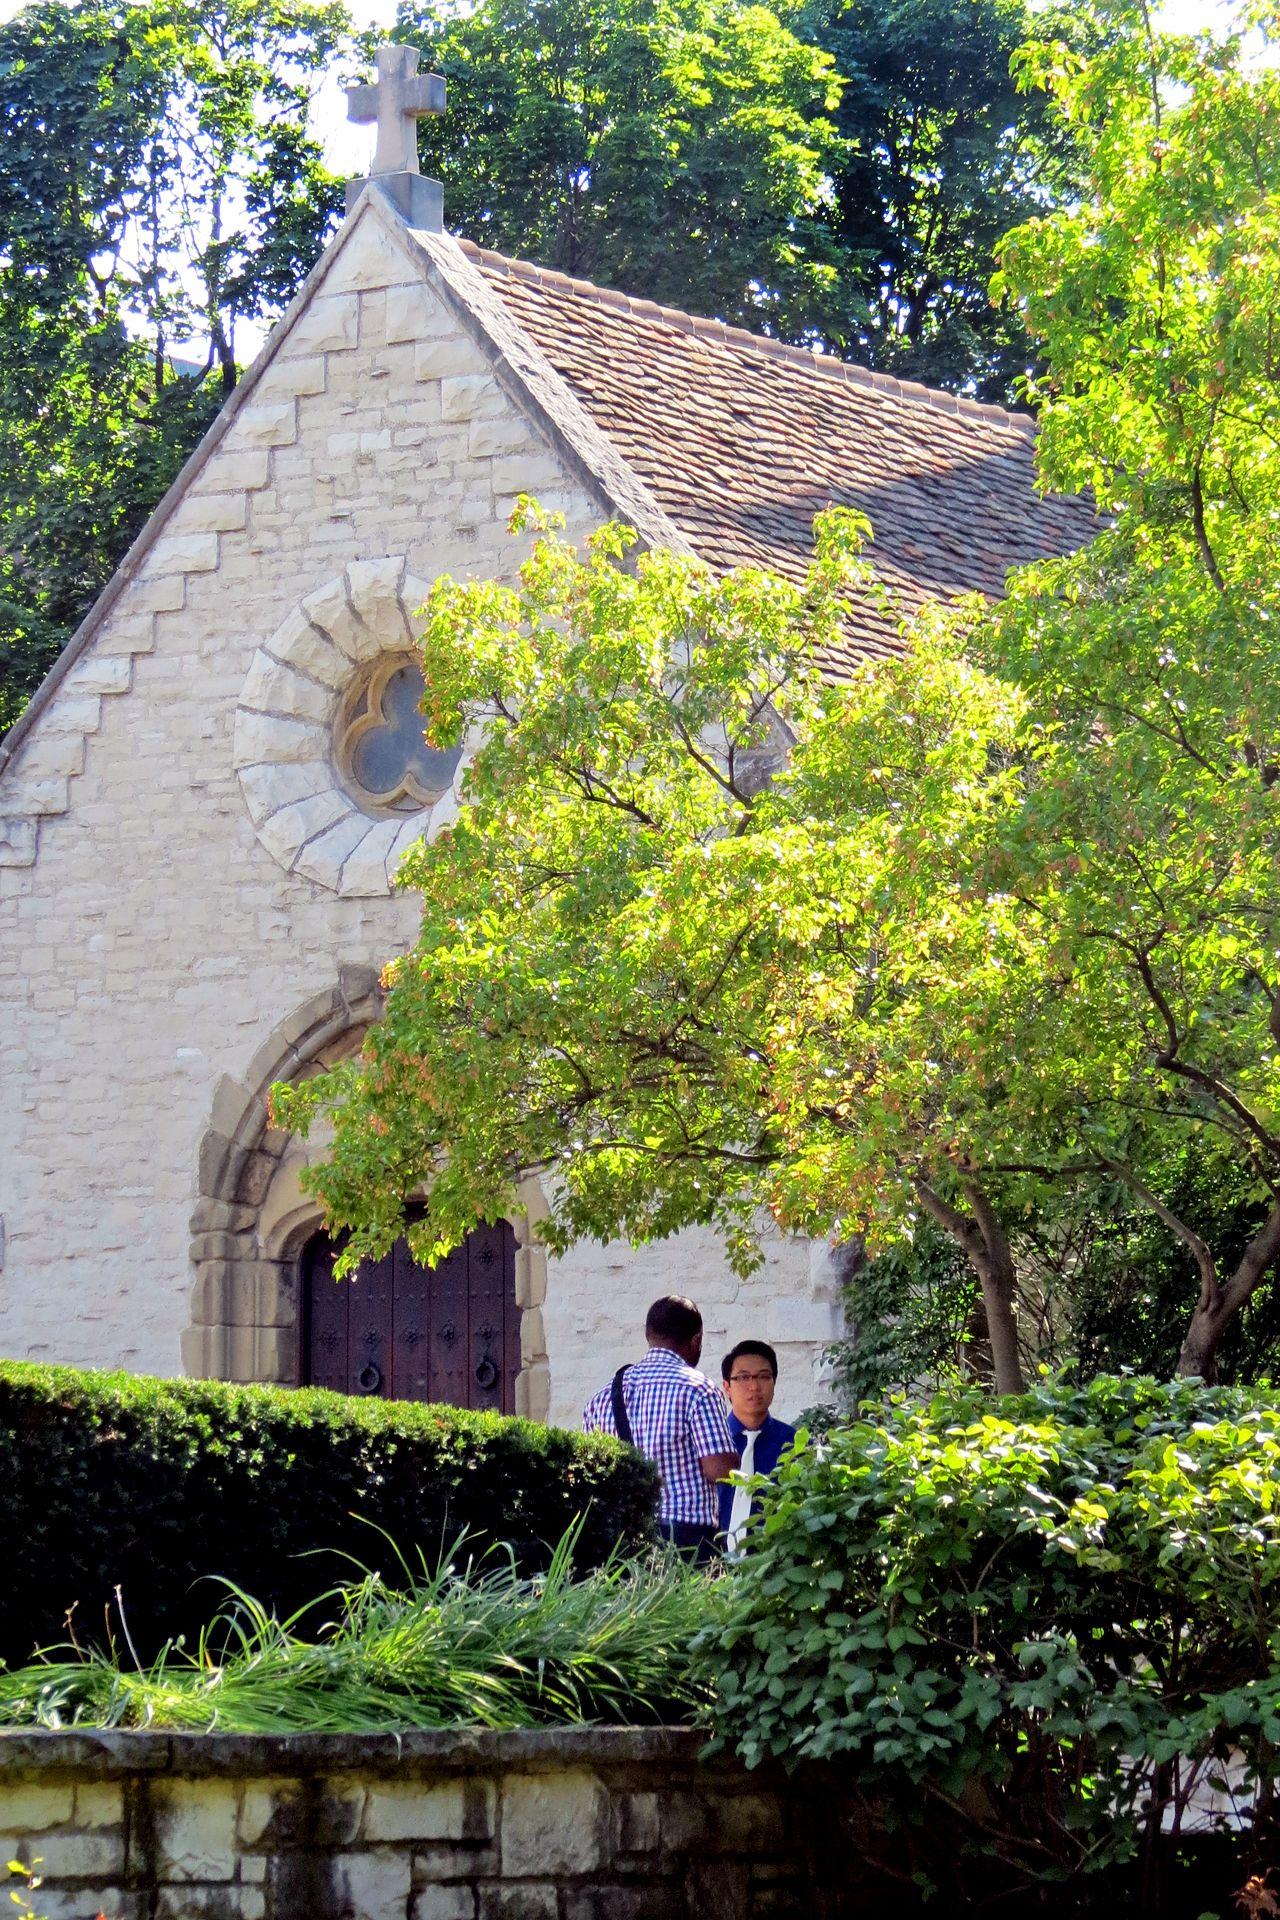 A conversation at Marquette University's St. Joan of Arc Chapel.